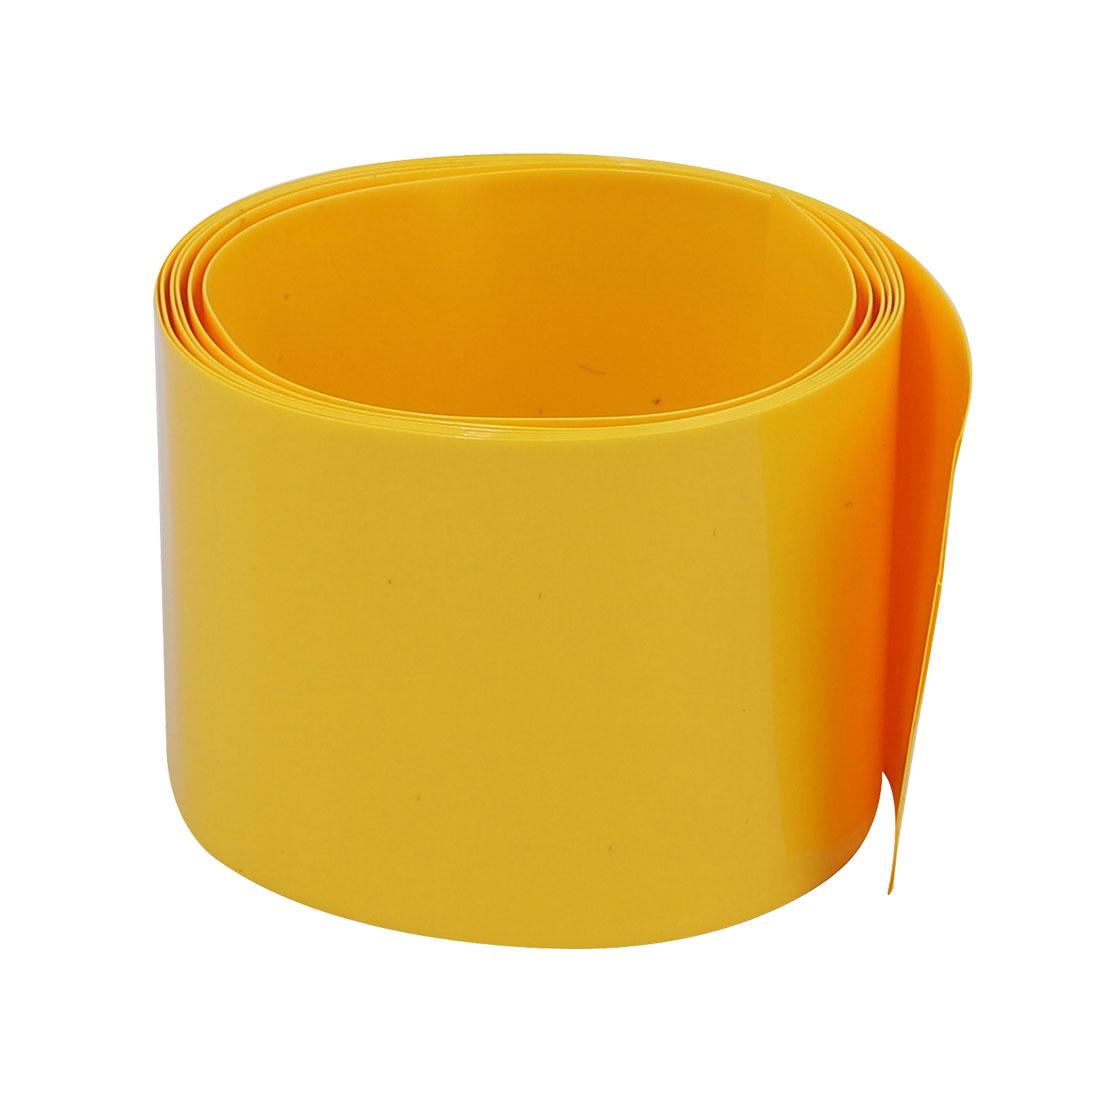 40mm Flat Width 1M Long PVC Heat Shrinkable Tube Yellow for 9V/AA Battery Pack